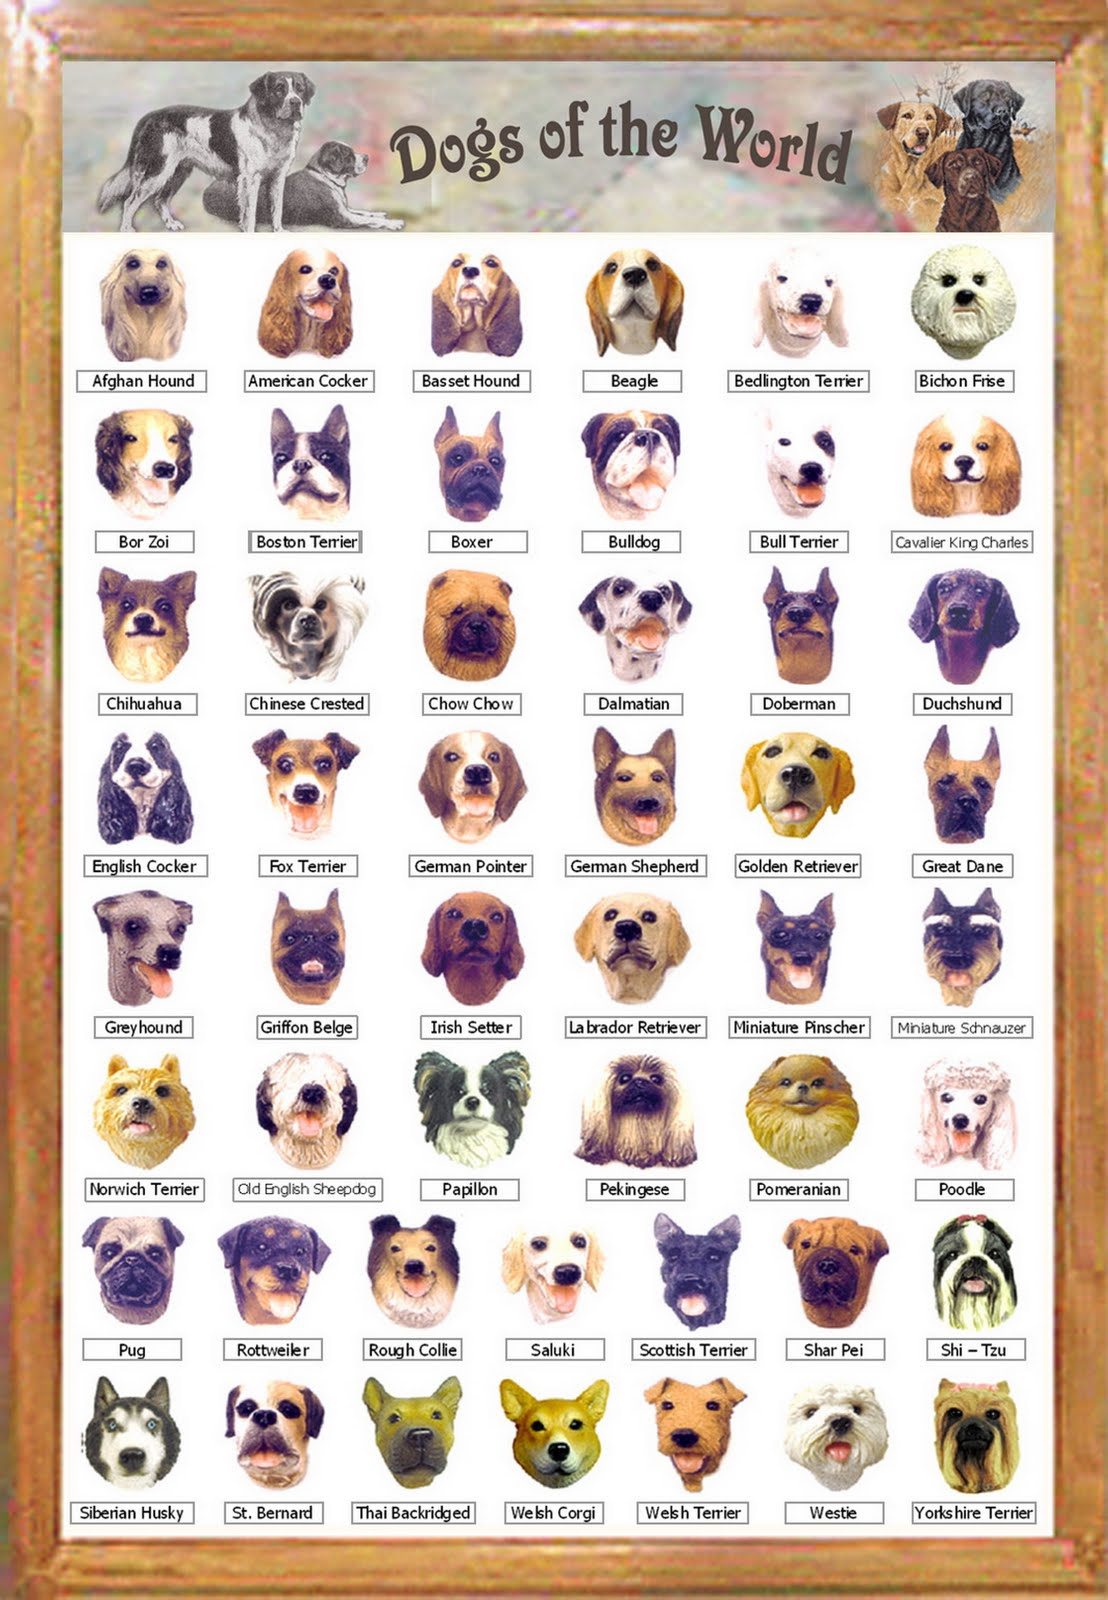 Dogs breeds dogs breeds dogs breeds